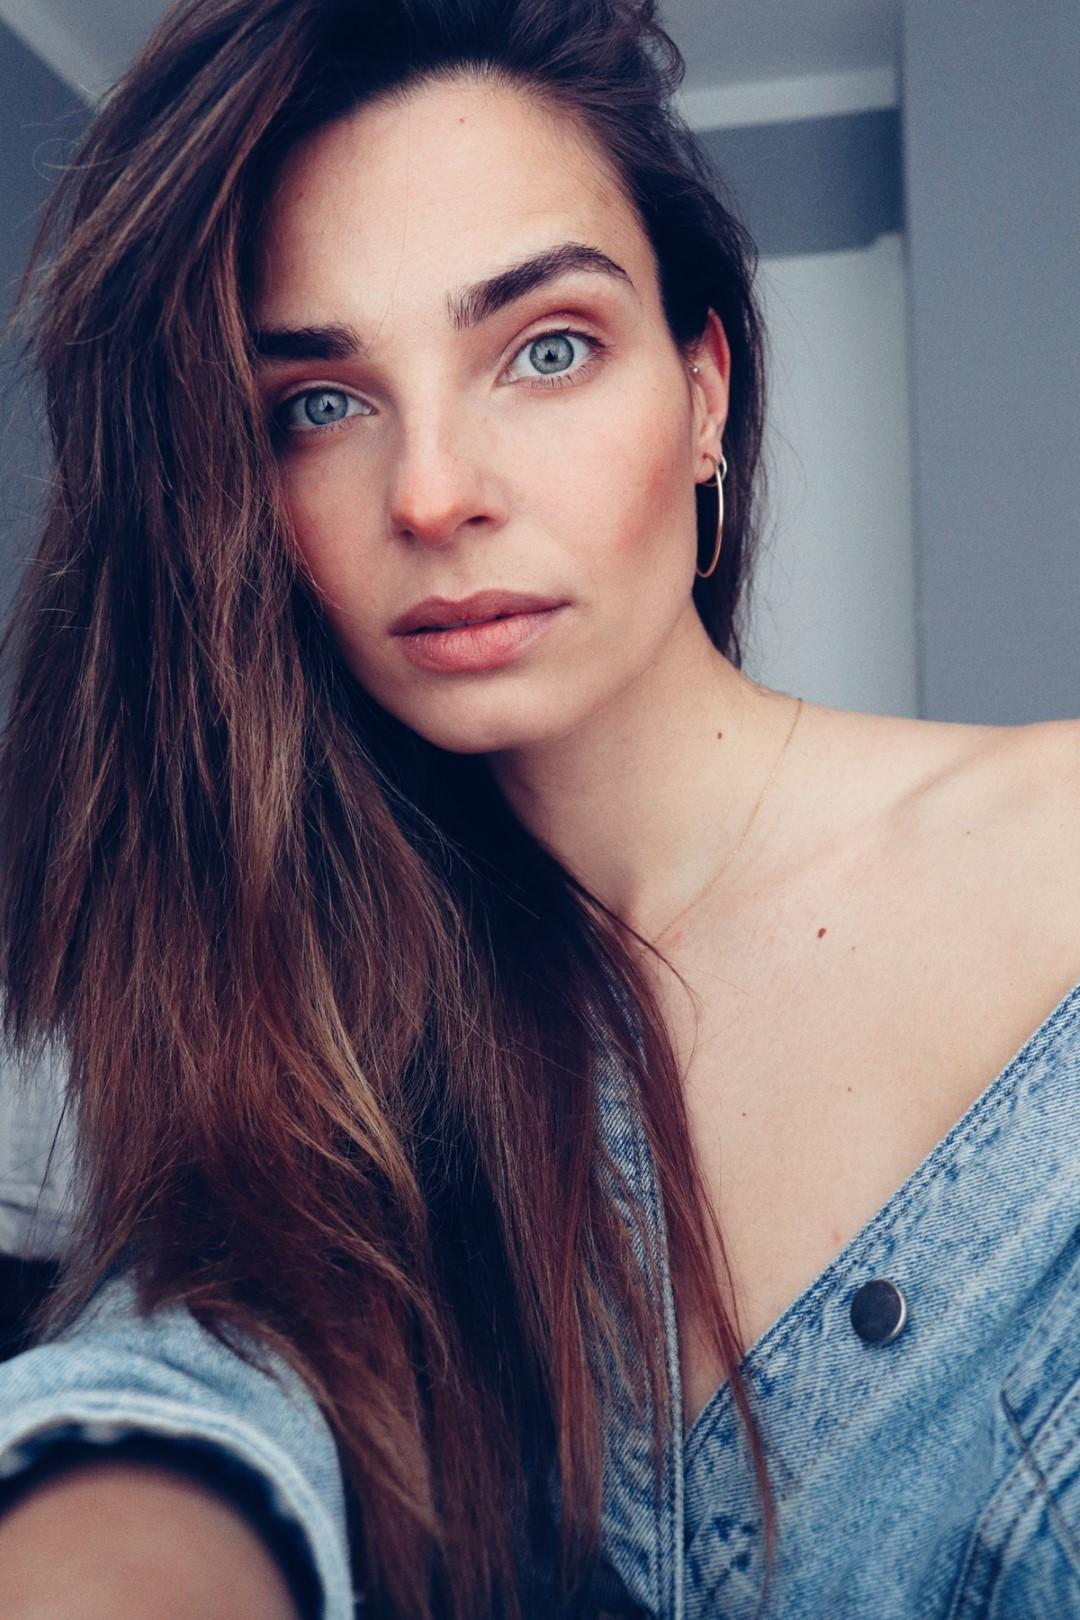 Suzana Horvat